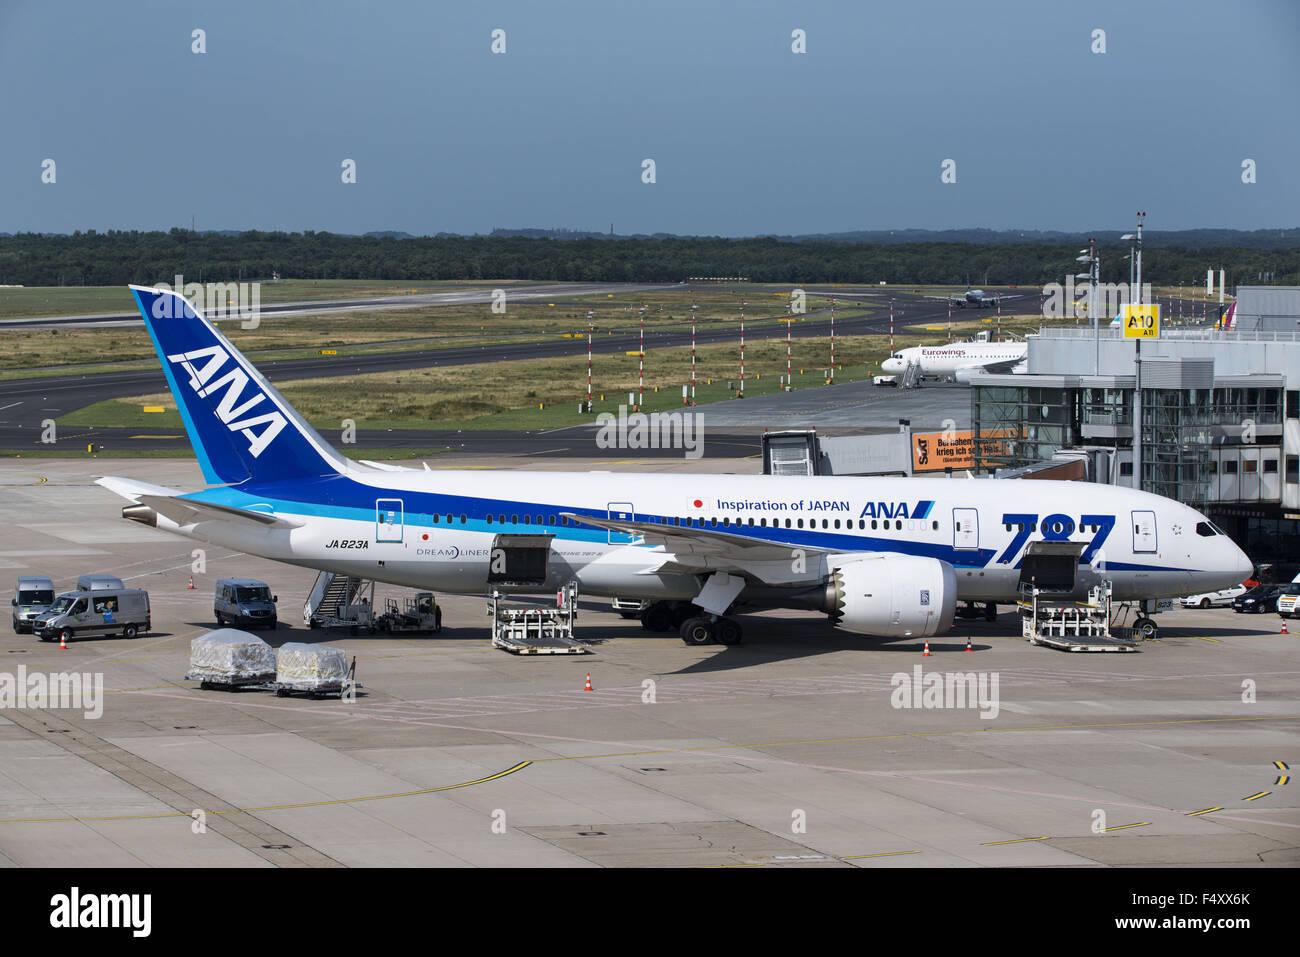 ANA Boing 787, All Nippon Airways, loading, Düsseldorf Airport, DUS, North Rhine-Westphalia, Germany - Stock Image